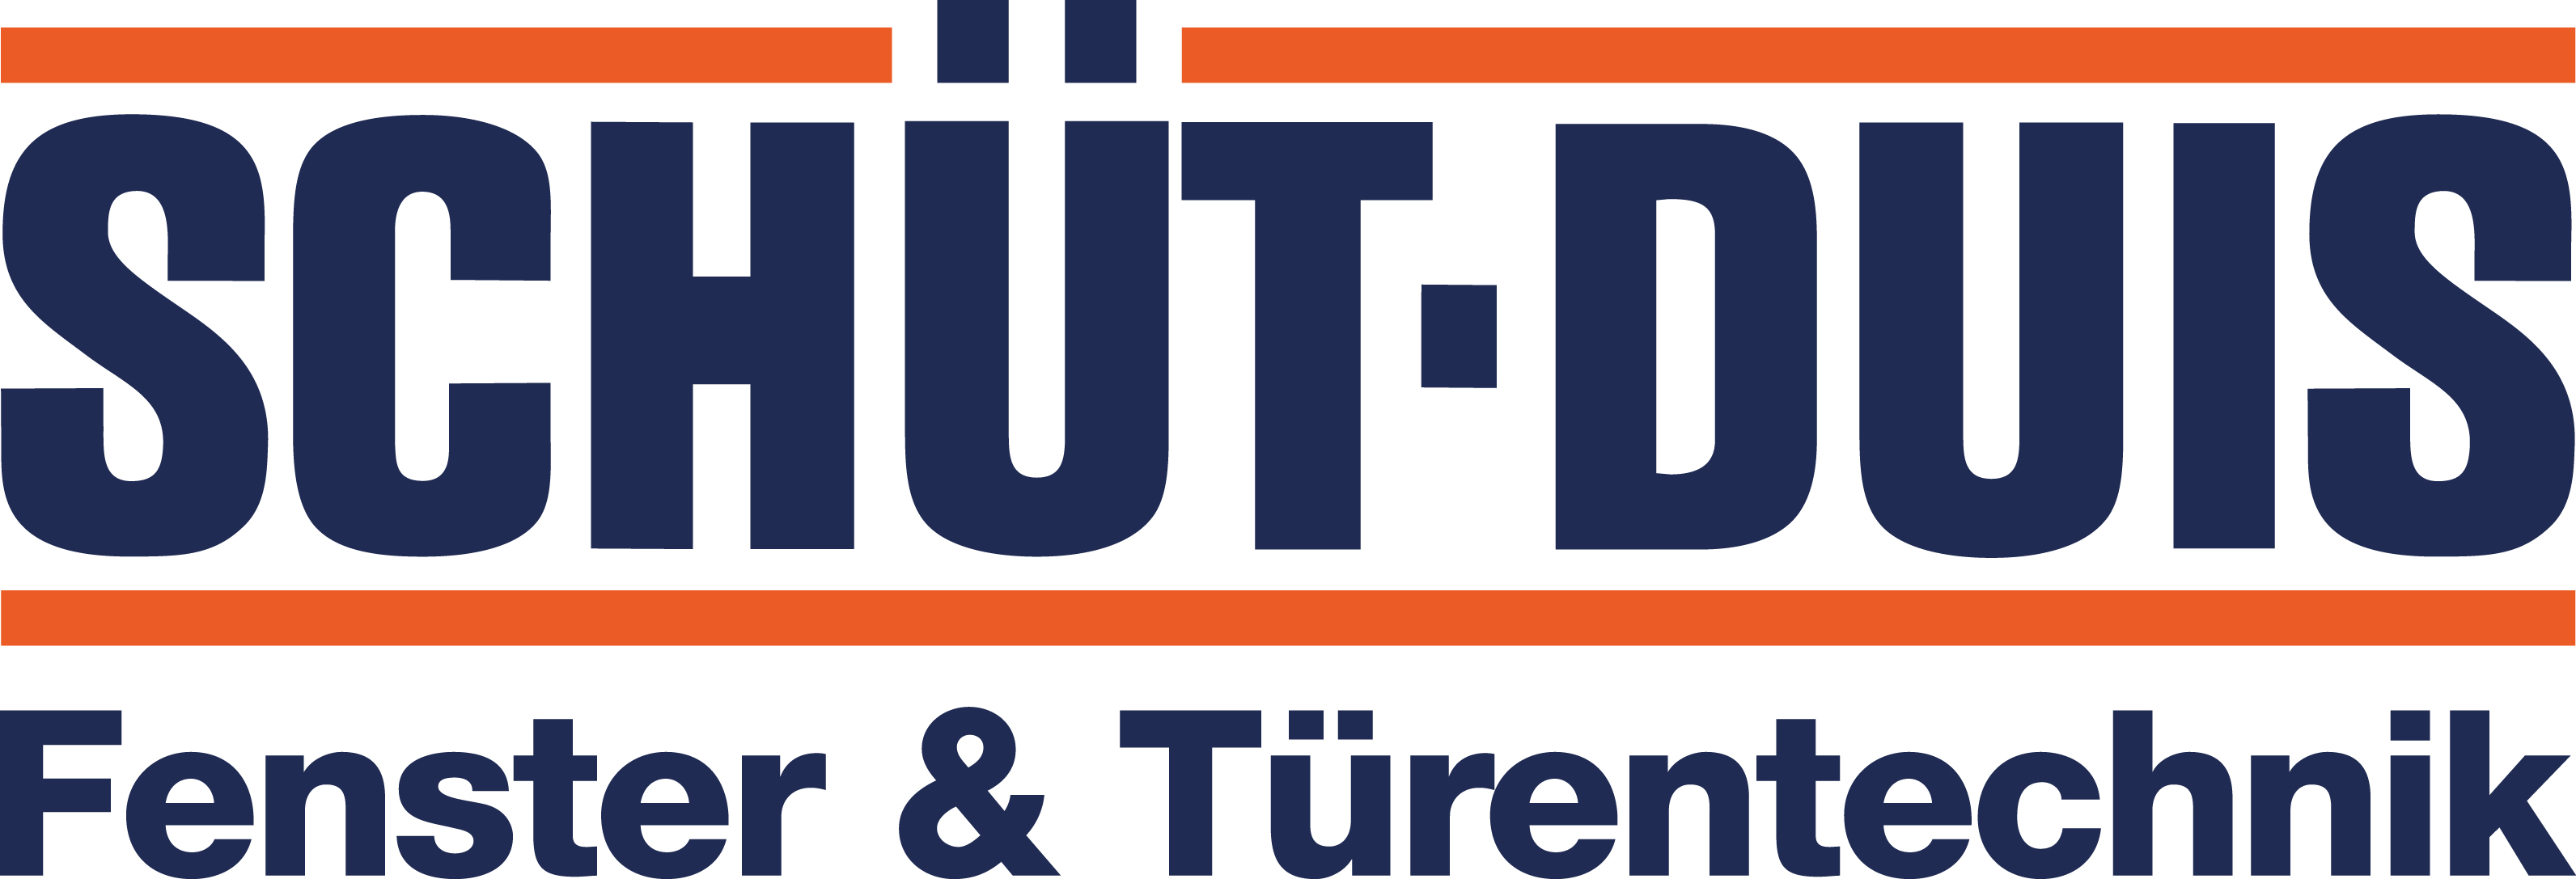 Logo schuet-duis_logo_orange_rgb